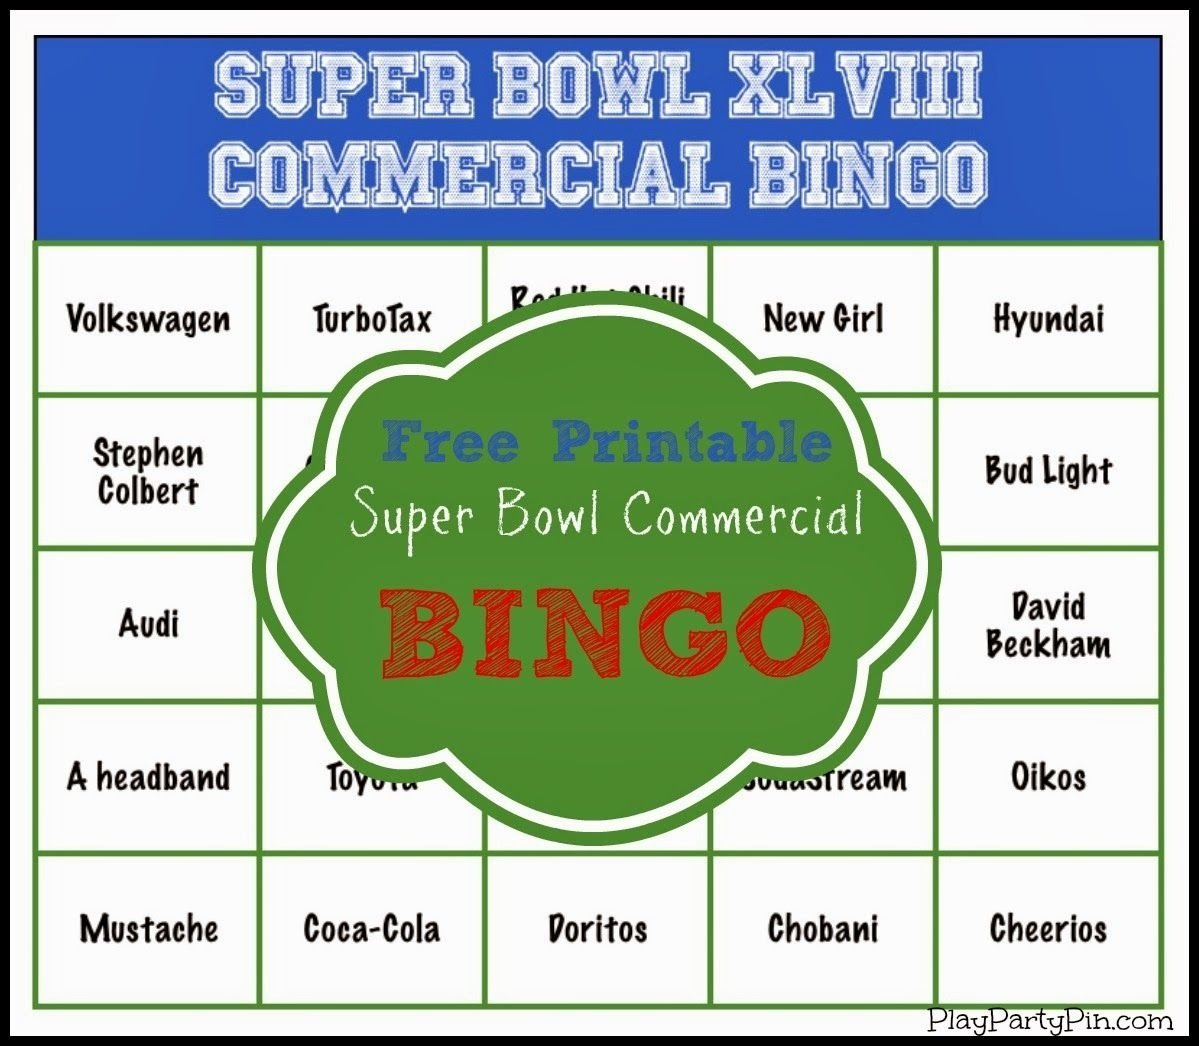 10 Perfect Super Bowl Party Games Ideas super bowl party game and prize ideas super bowl commercial bingo 1